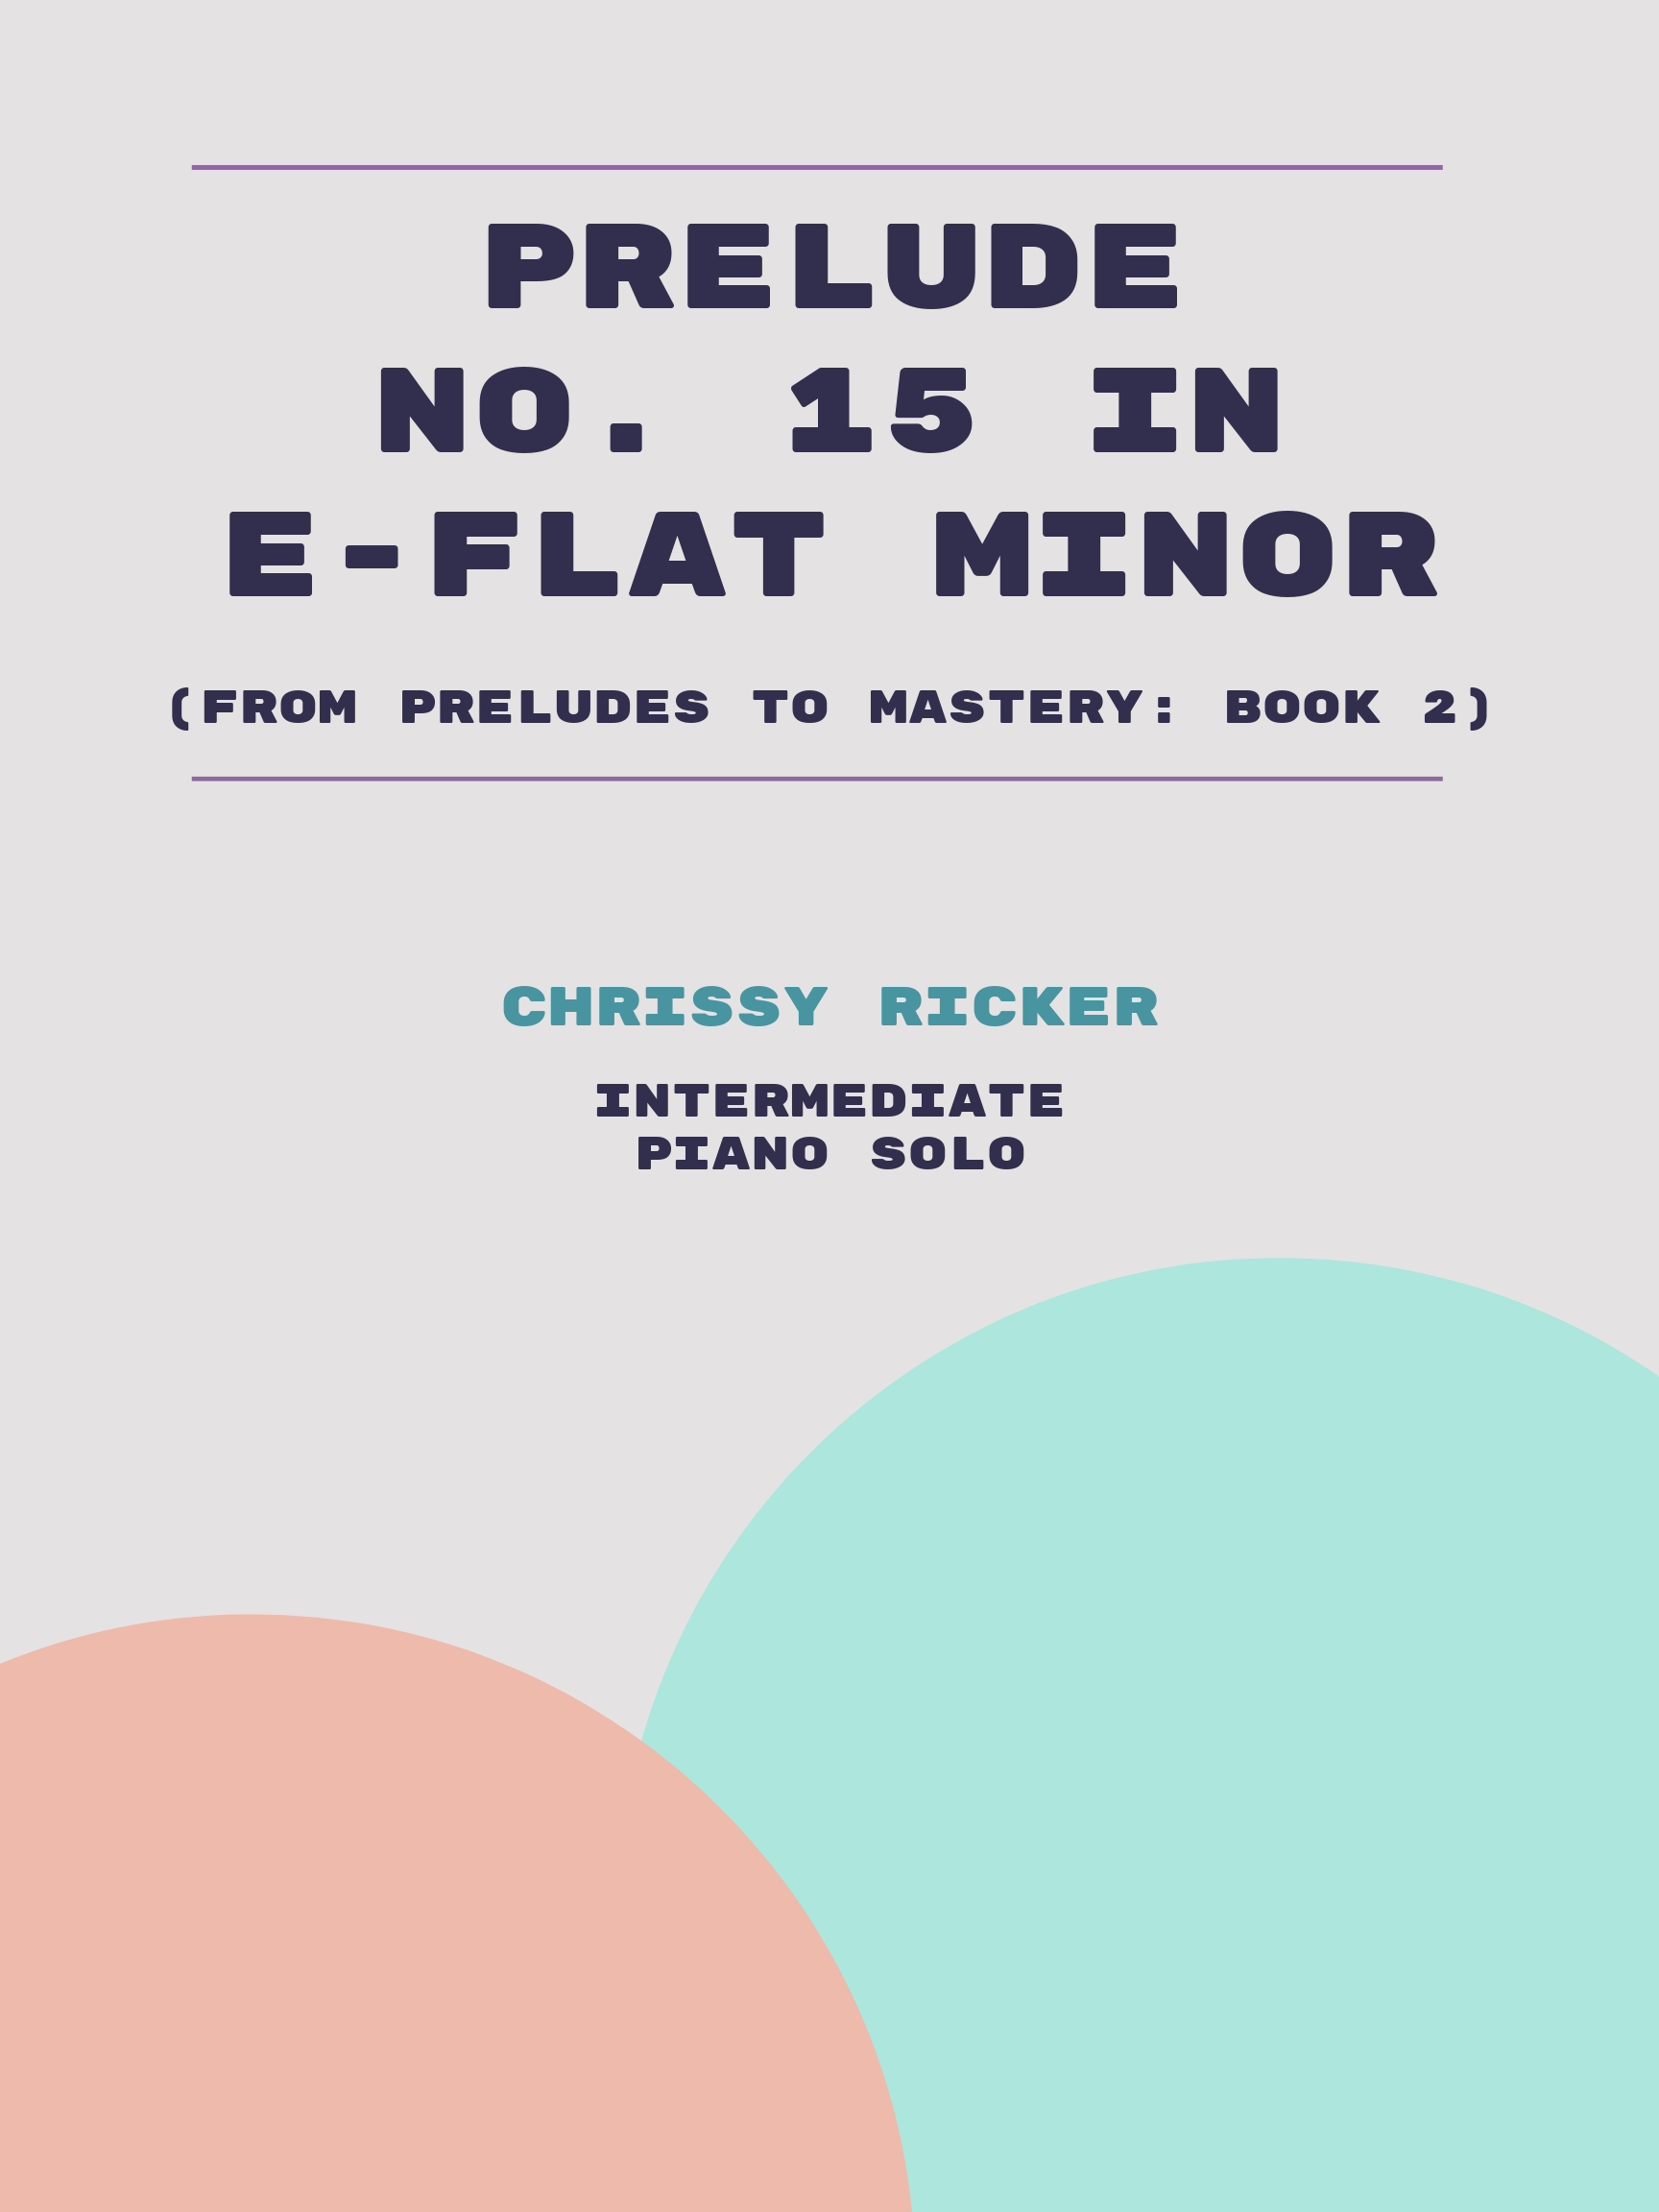 Prelude No. 15 in Eb minor by Chrissy Ricker